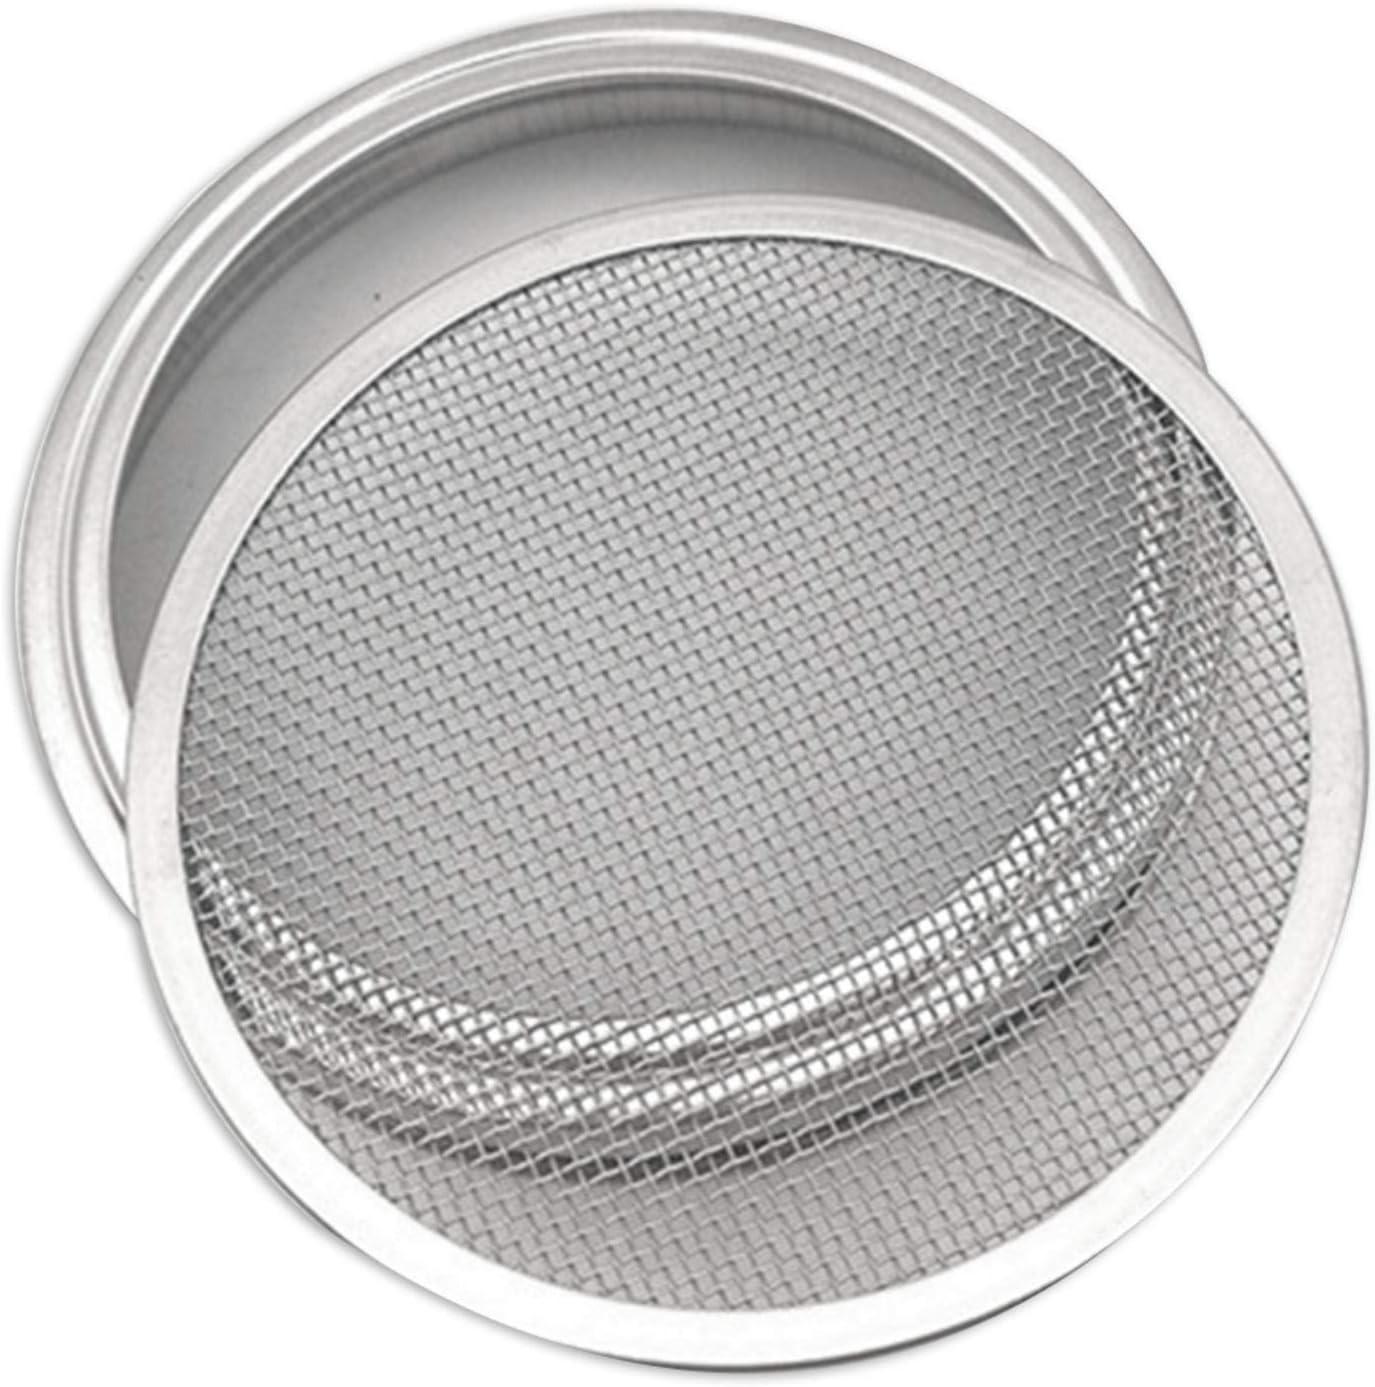 Sroomcla Kit de Tapa de Tarro de germinaci/ón de Acero Inoxidable 304 Kit de Tapa de germinador de Semillas de colador de Malla para tarros de mas/ón de Boca Ancha enlatados fabricaci/ón de Designer